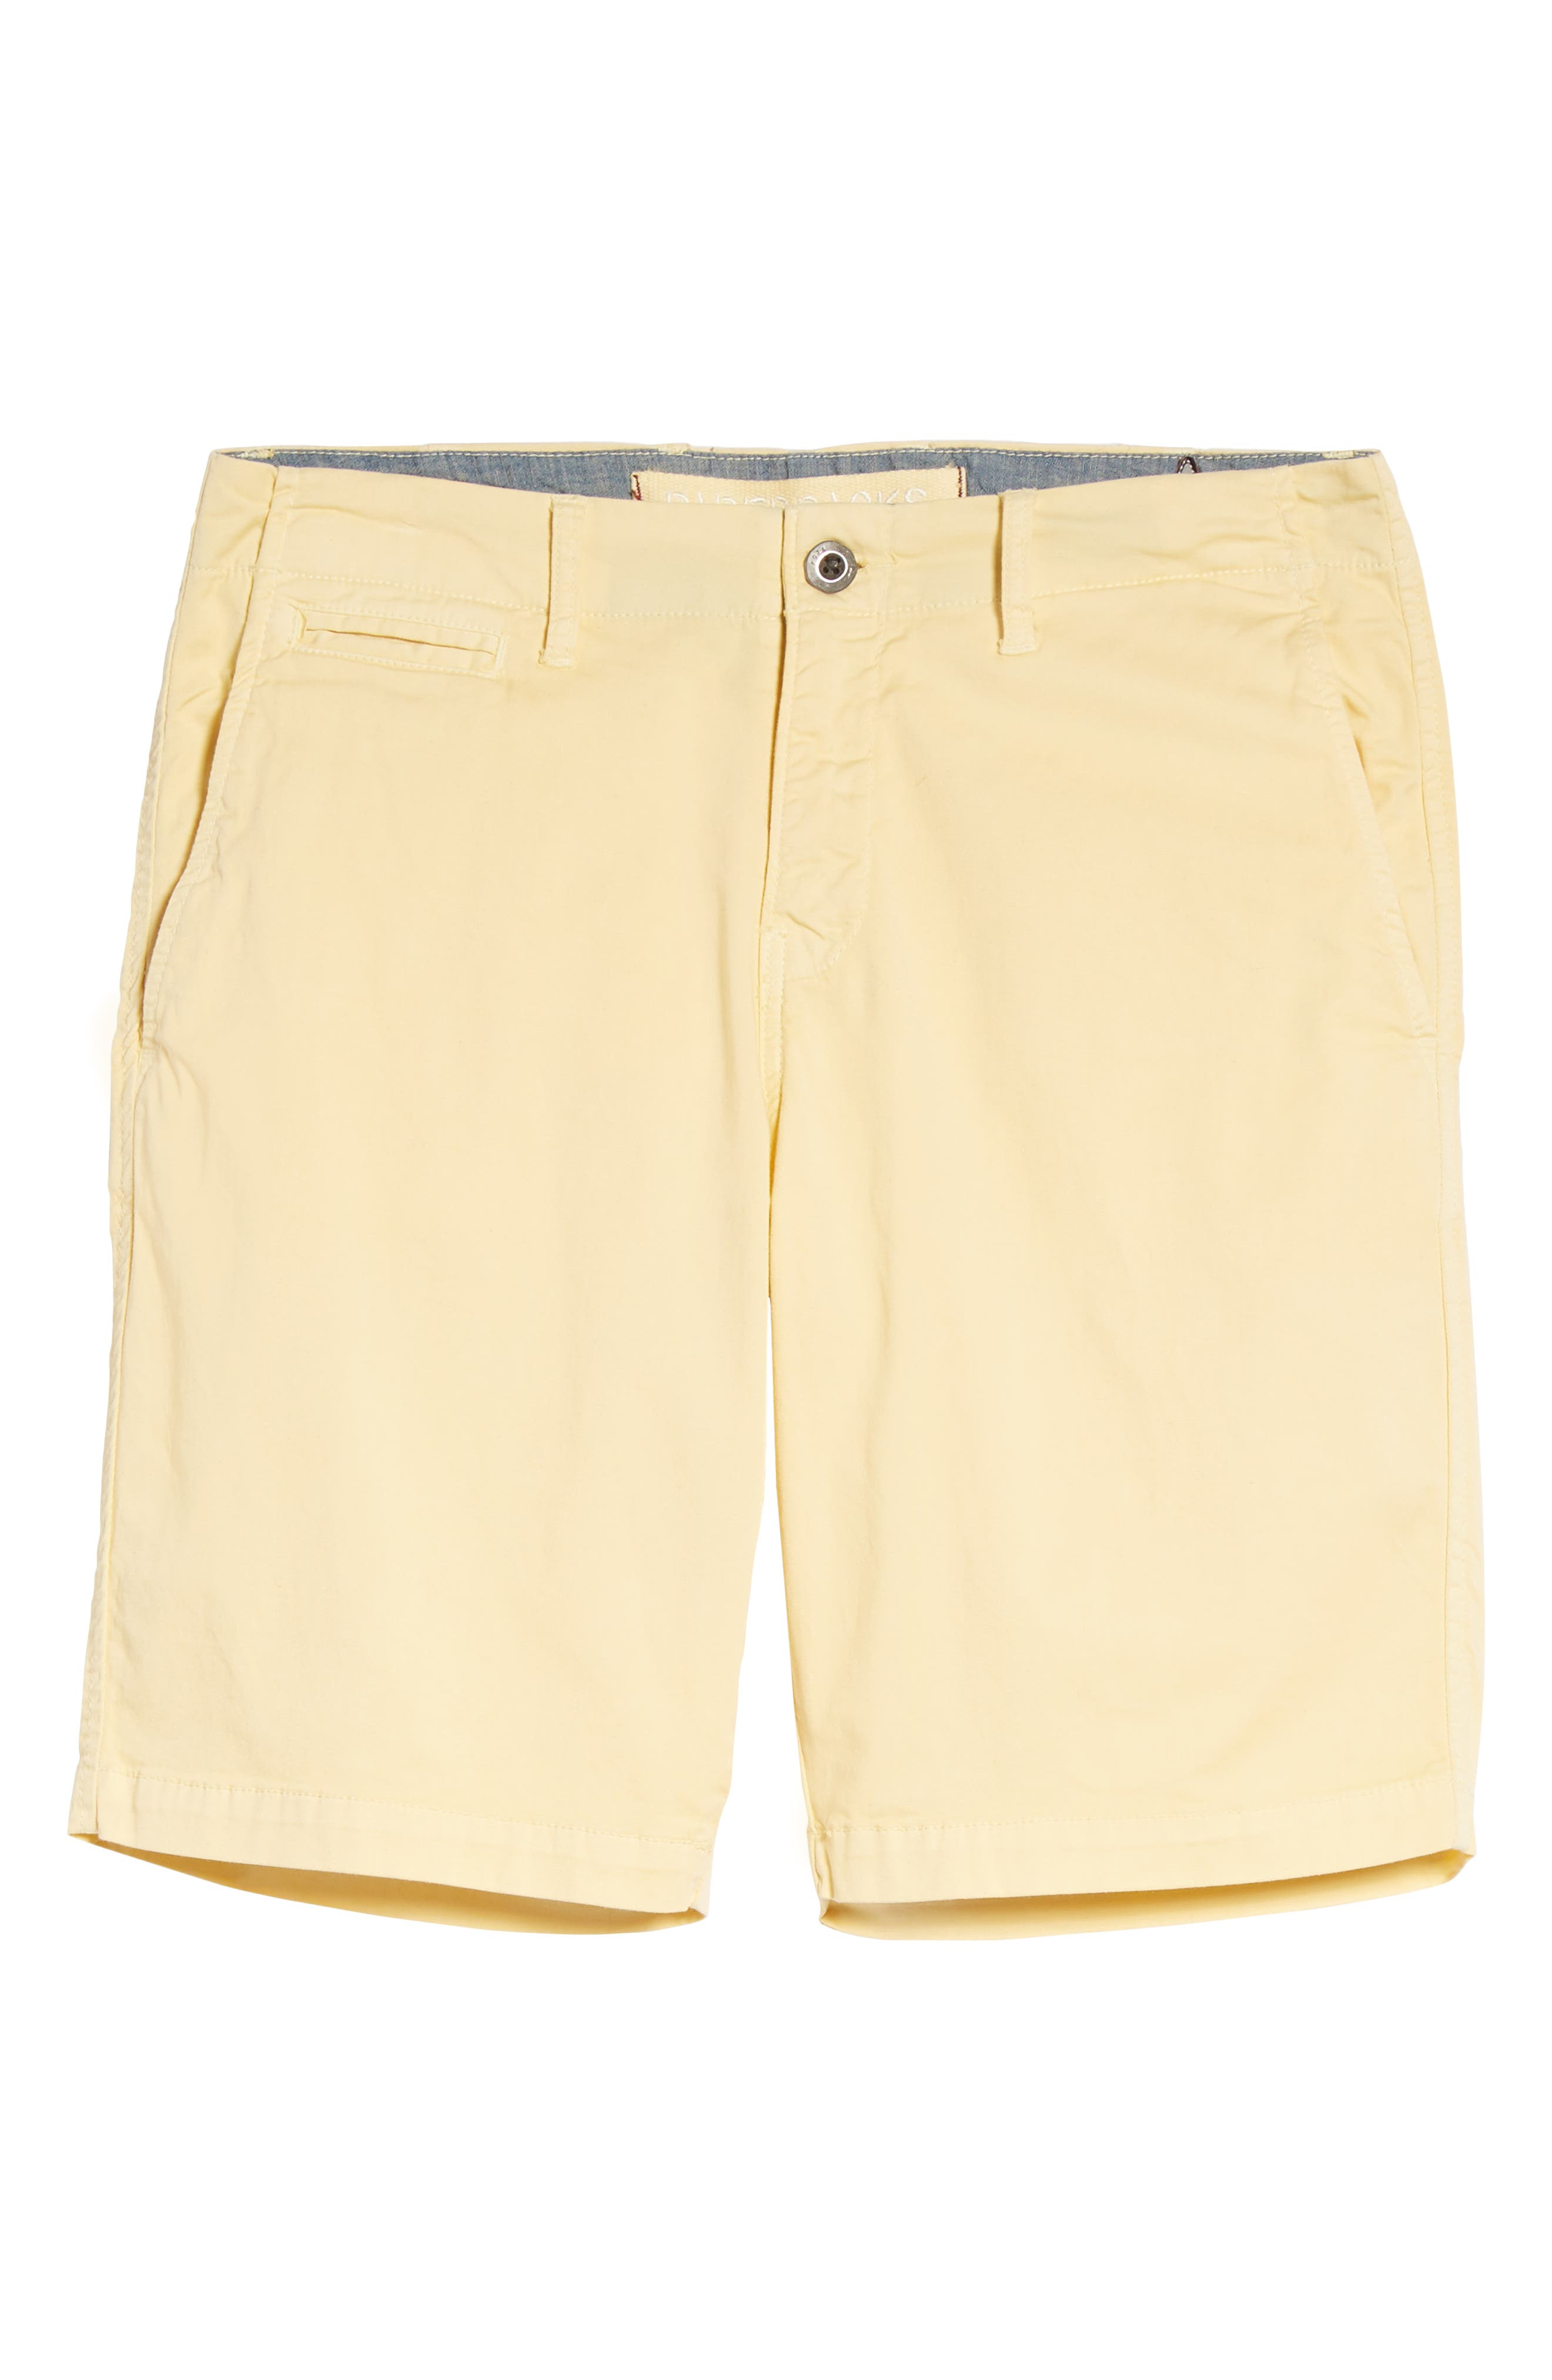 St. Barts Twill Shorts,                             Alternate thumbnail 72, color,